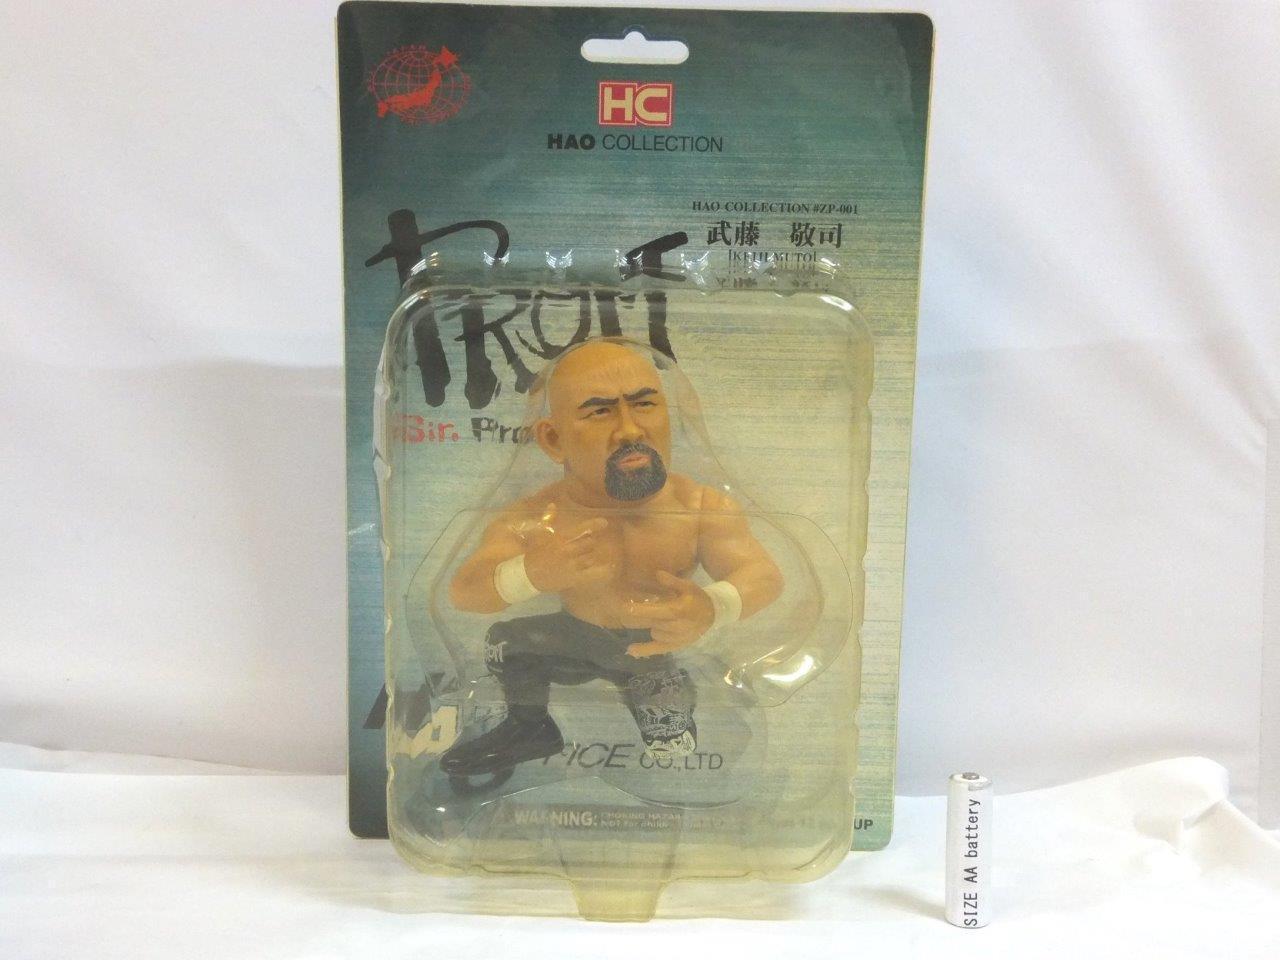 KEIJI MUTO bambola NJPW AJPW WCW HAO COLLECTION cifra  MUTA WRESTLER  alla moda